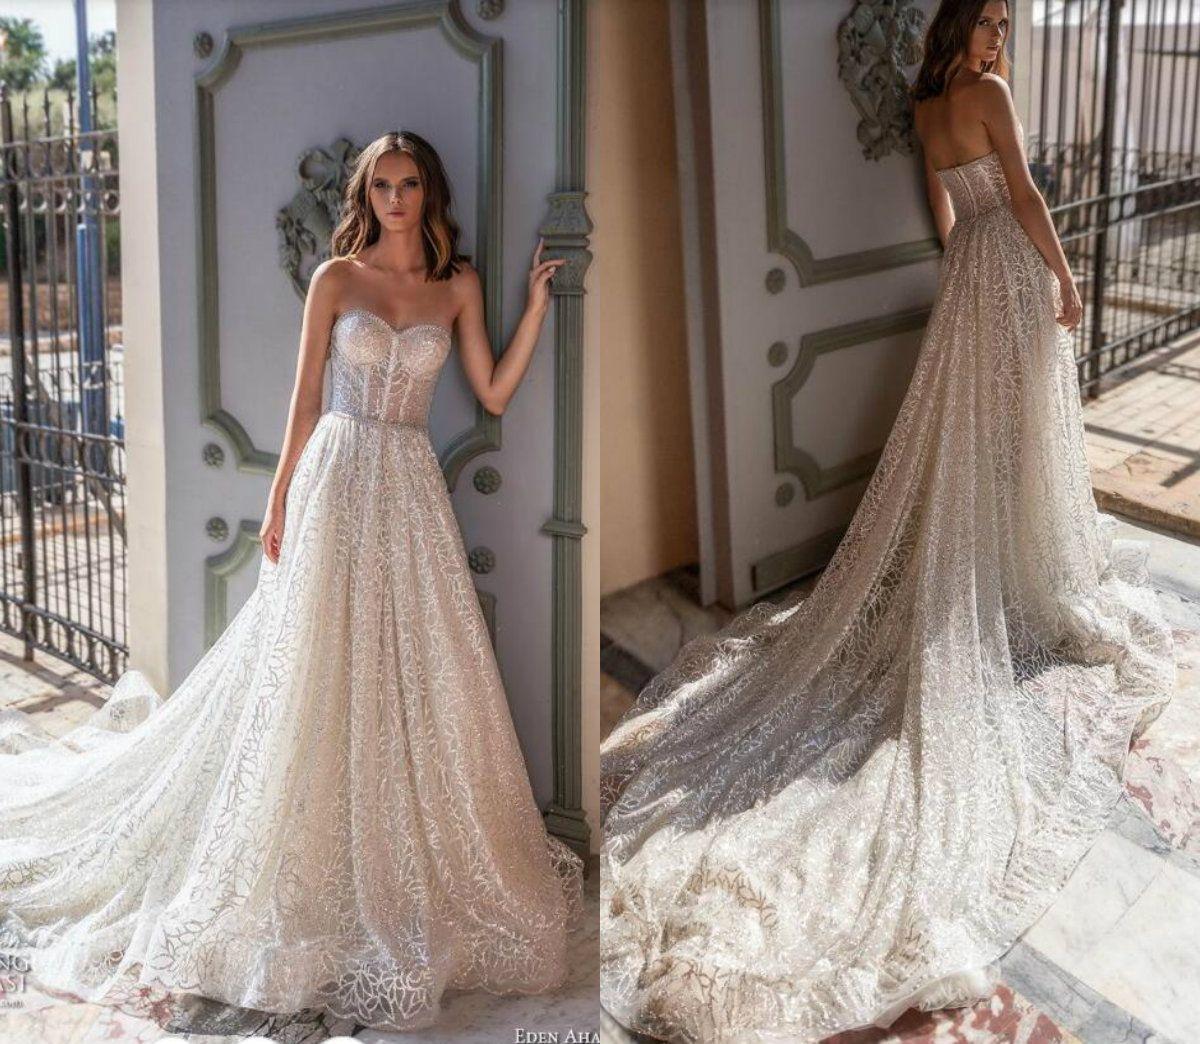 Beach Wedding Dress with Bling